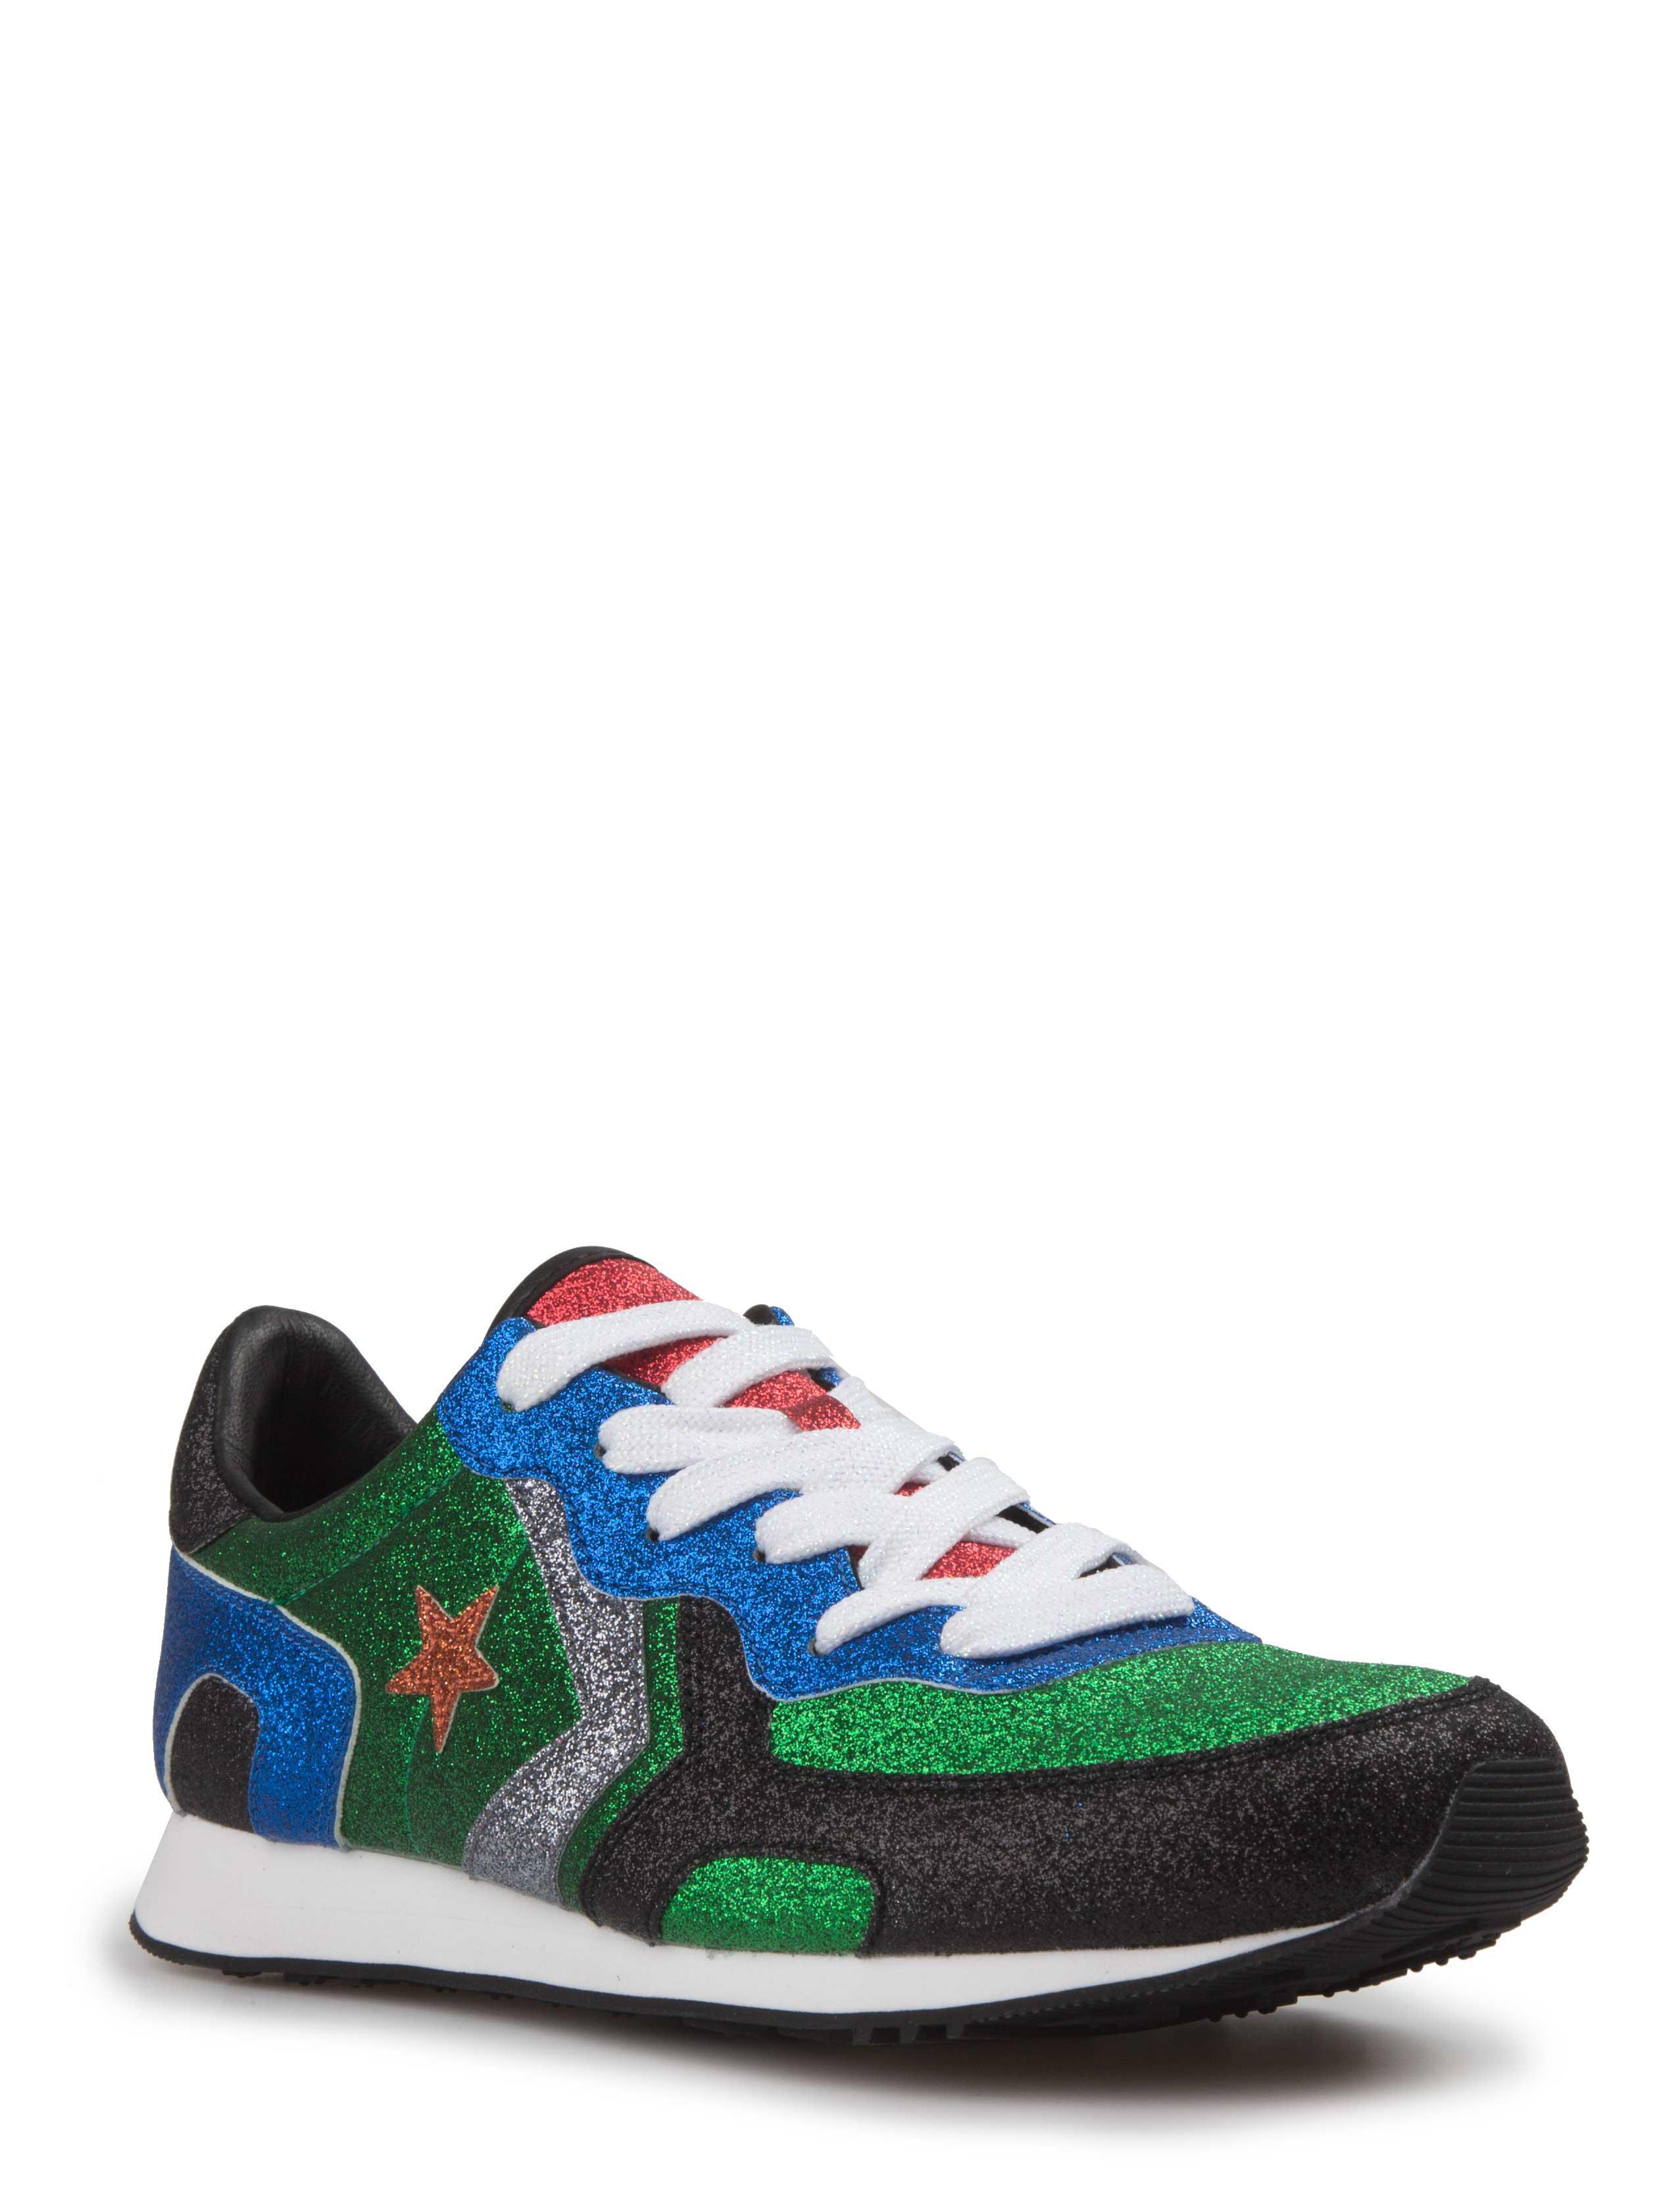 Grenson Khaki Converse Edition Thunderbolt OX Sneakers zXoMNKa3